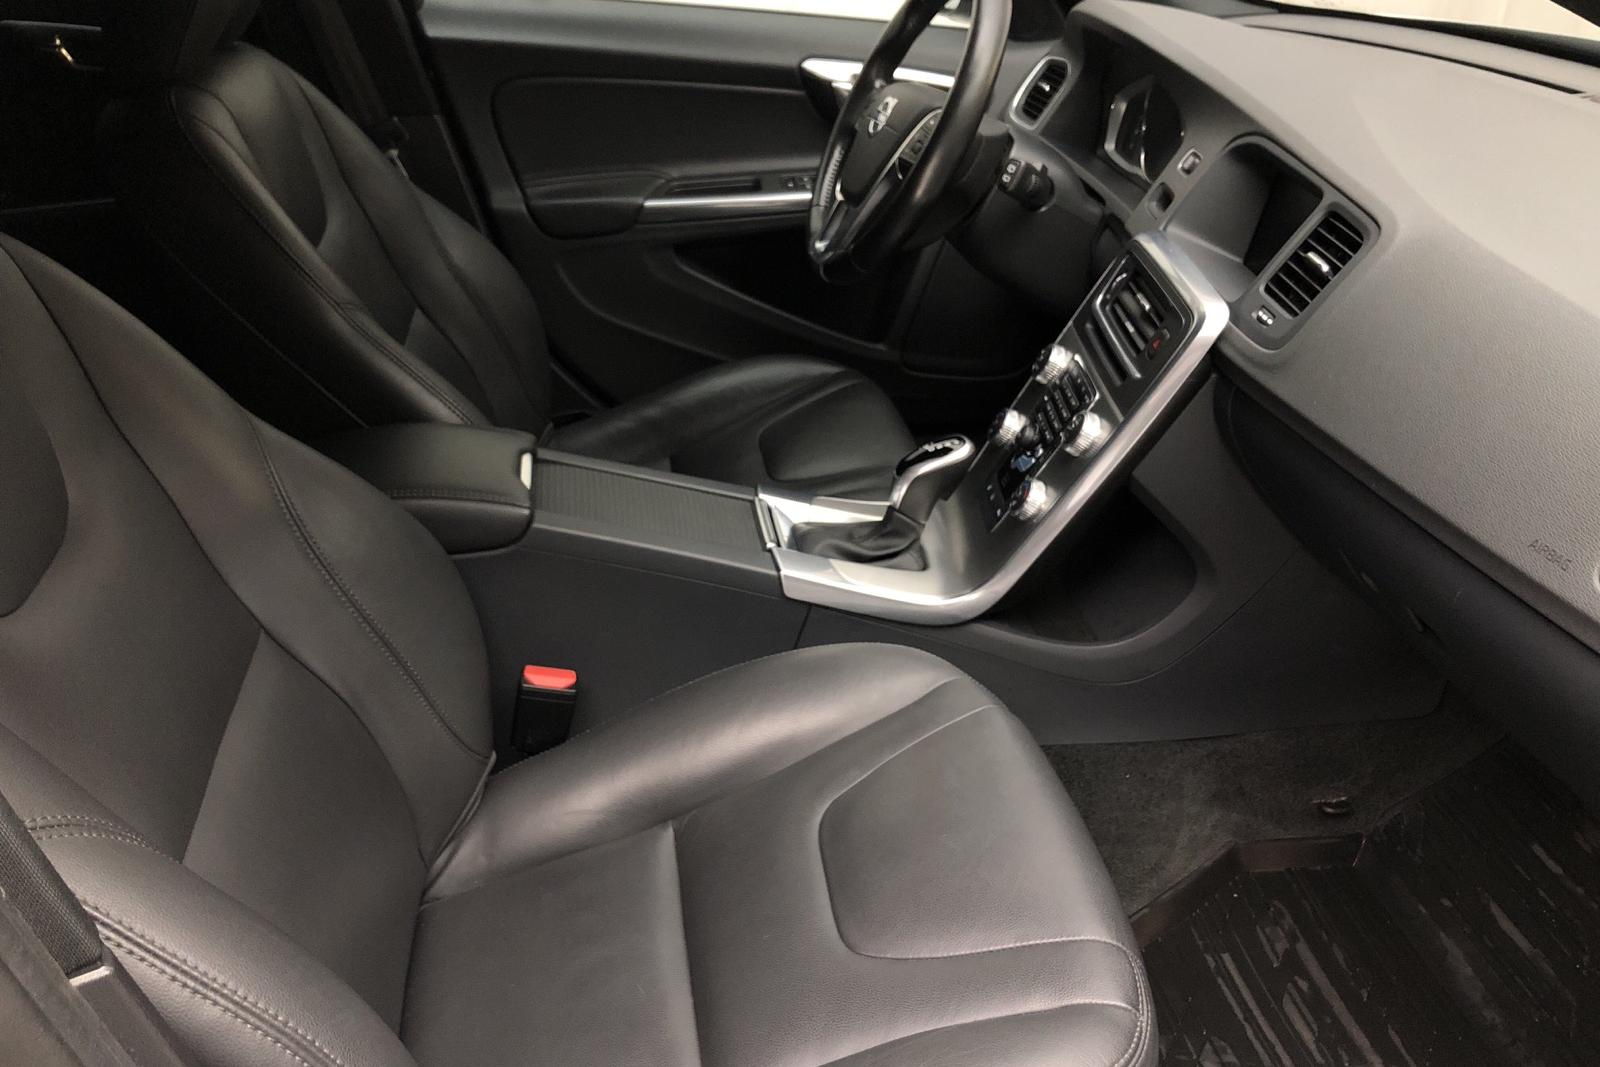 Volvo V60 D4 Cross Country (190hk) - 7 100 mil - Automat - silver - 2017